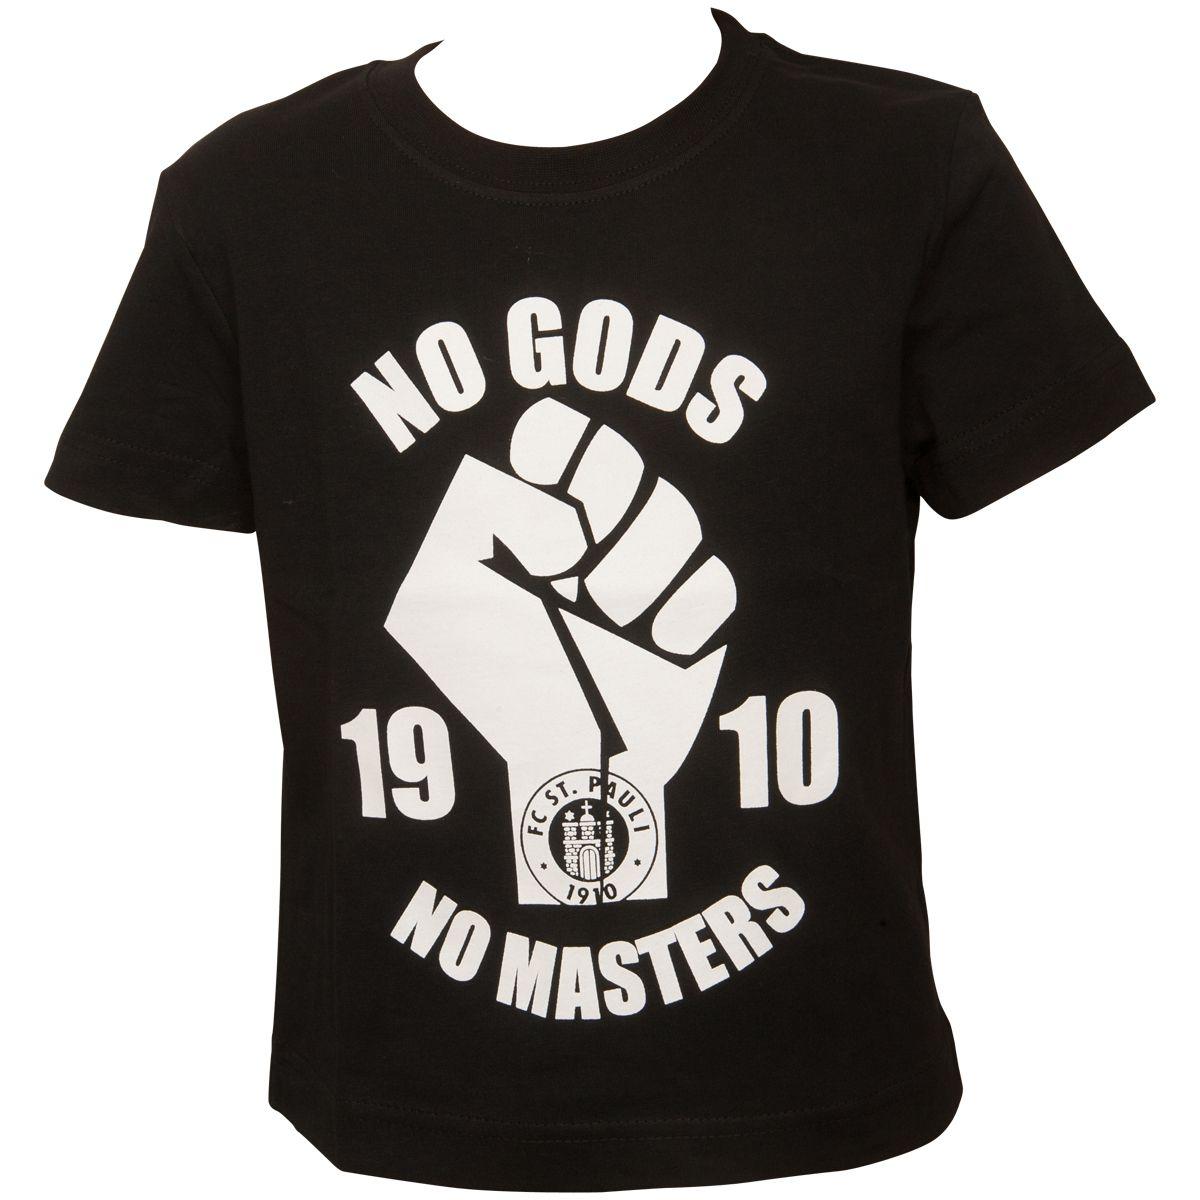 FC St. Pauli - Kinder T-Shirt No Gods - schwarz